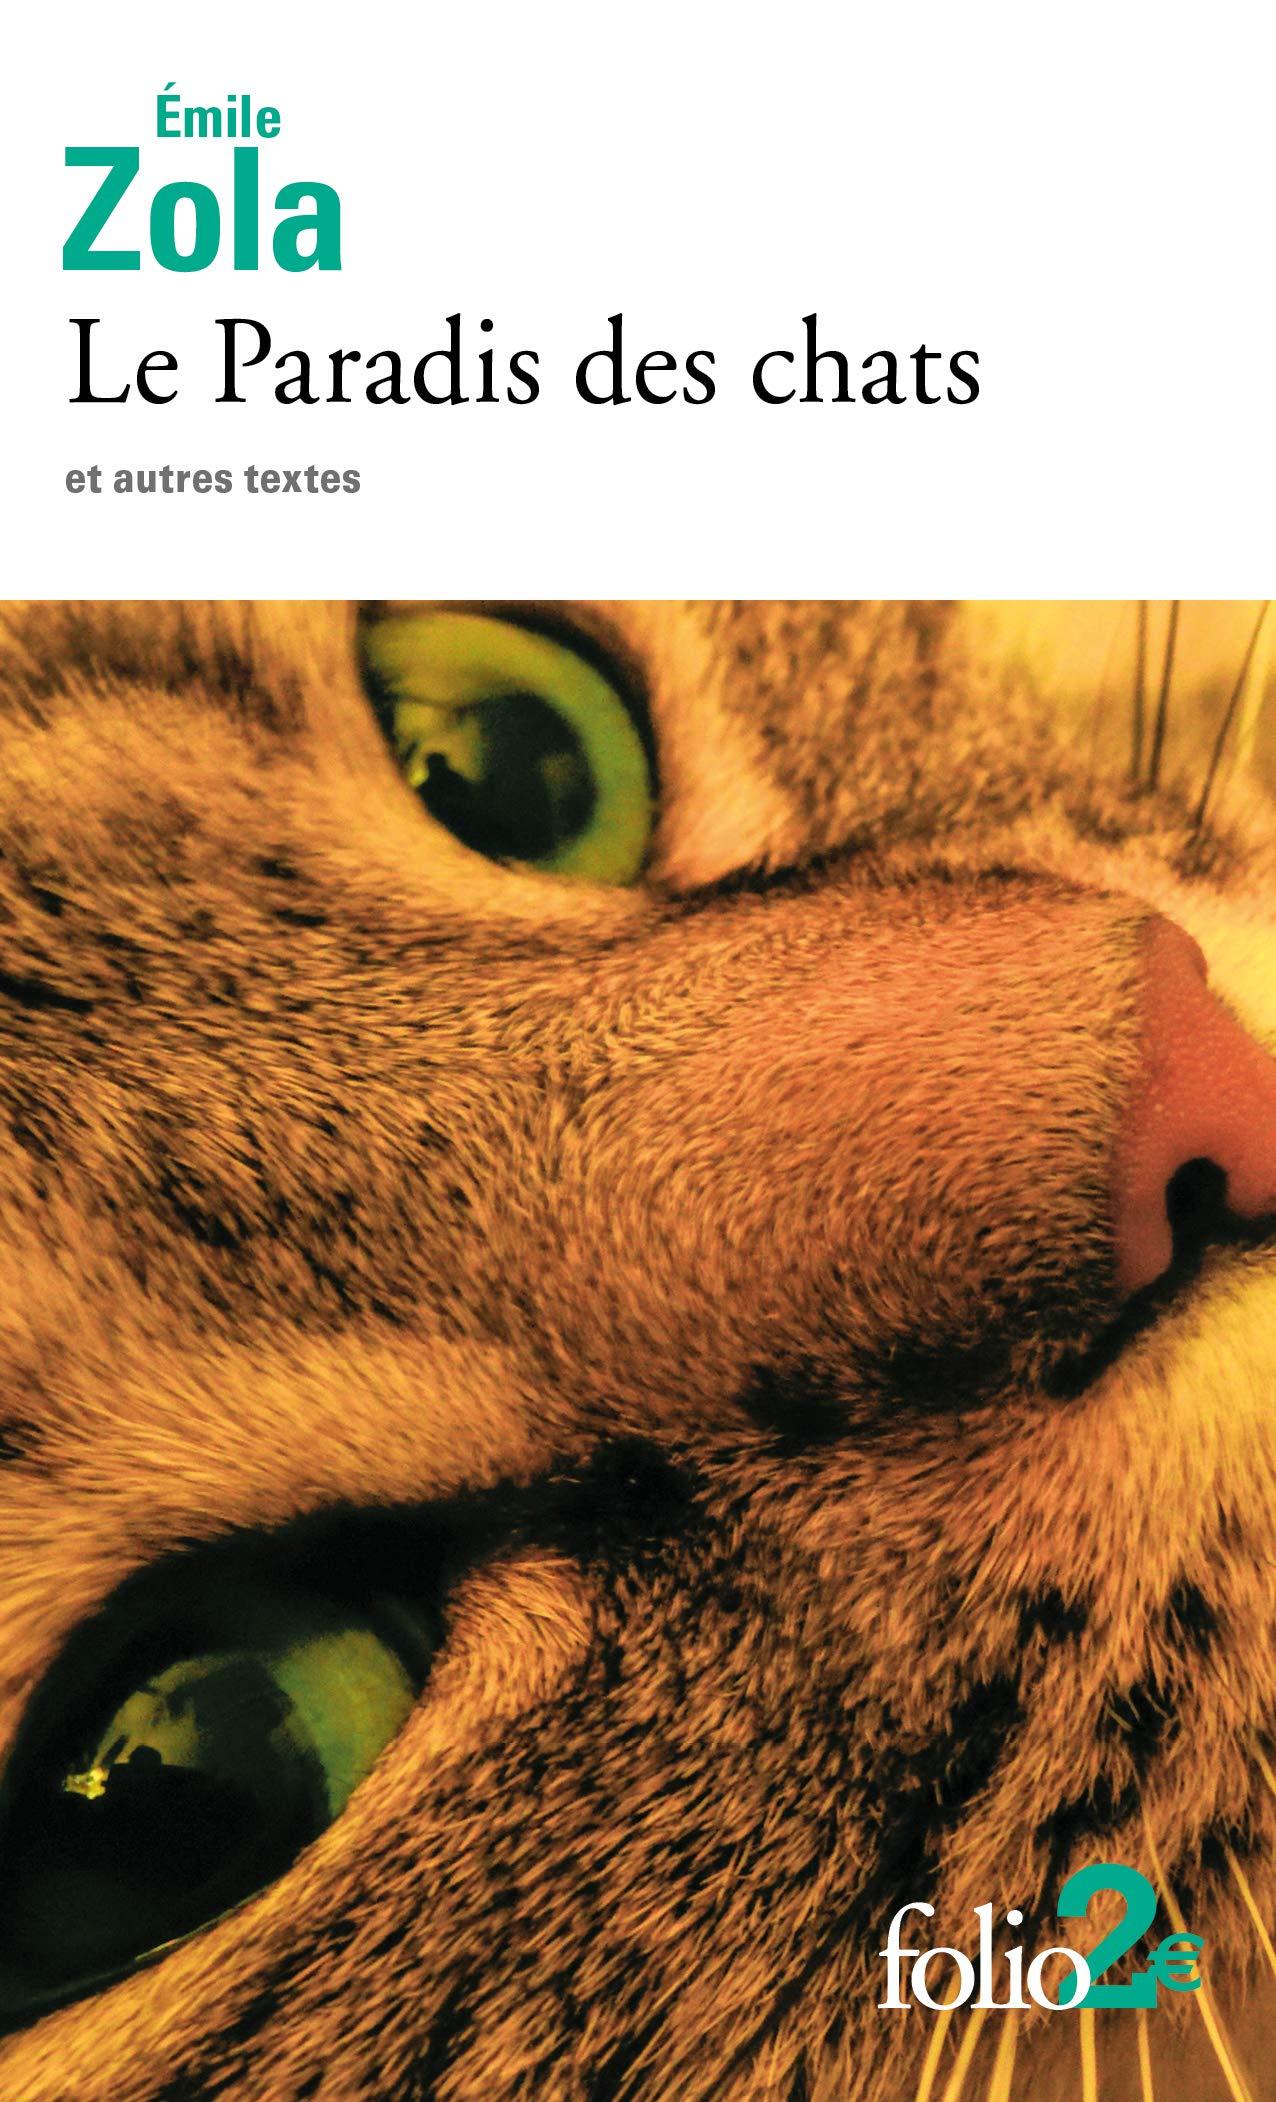 Le Paradis des chats thumbnail